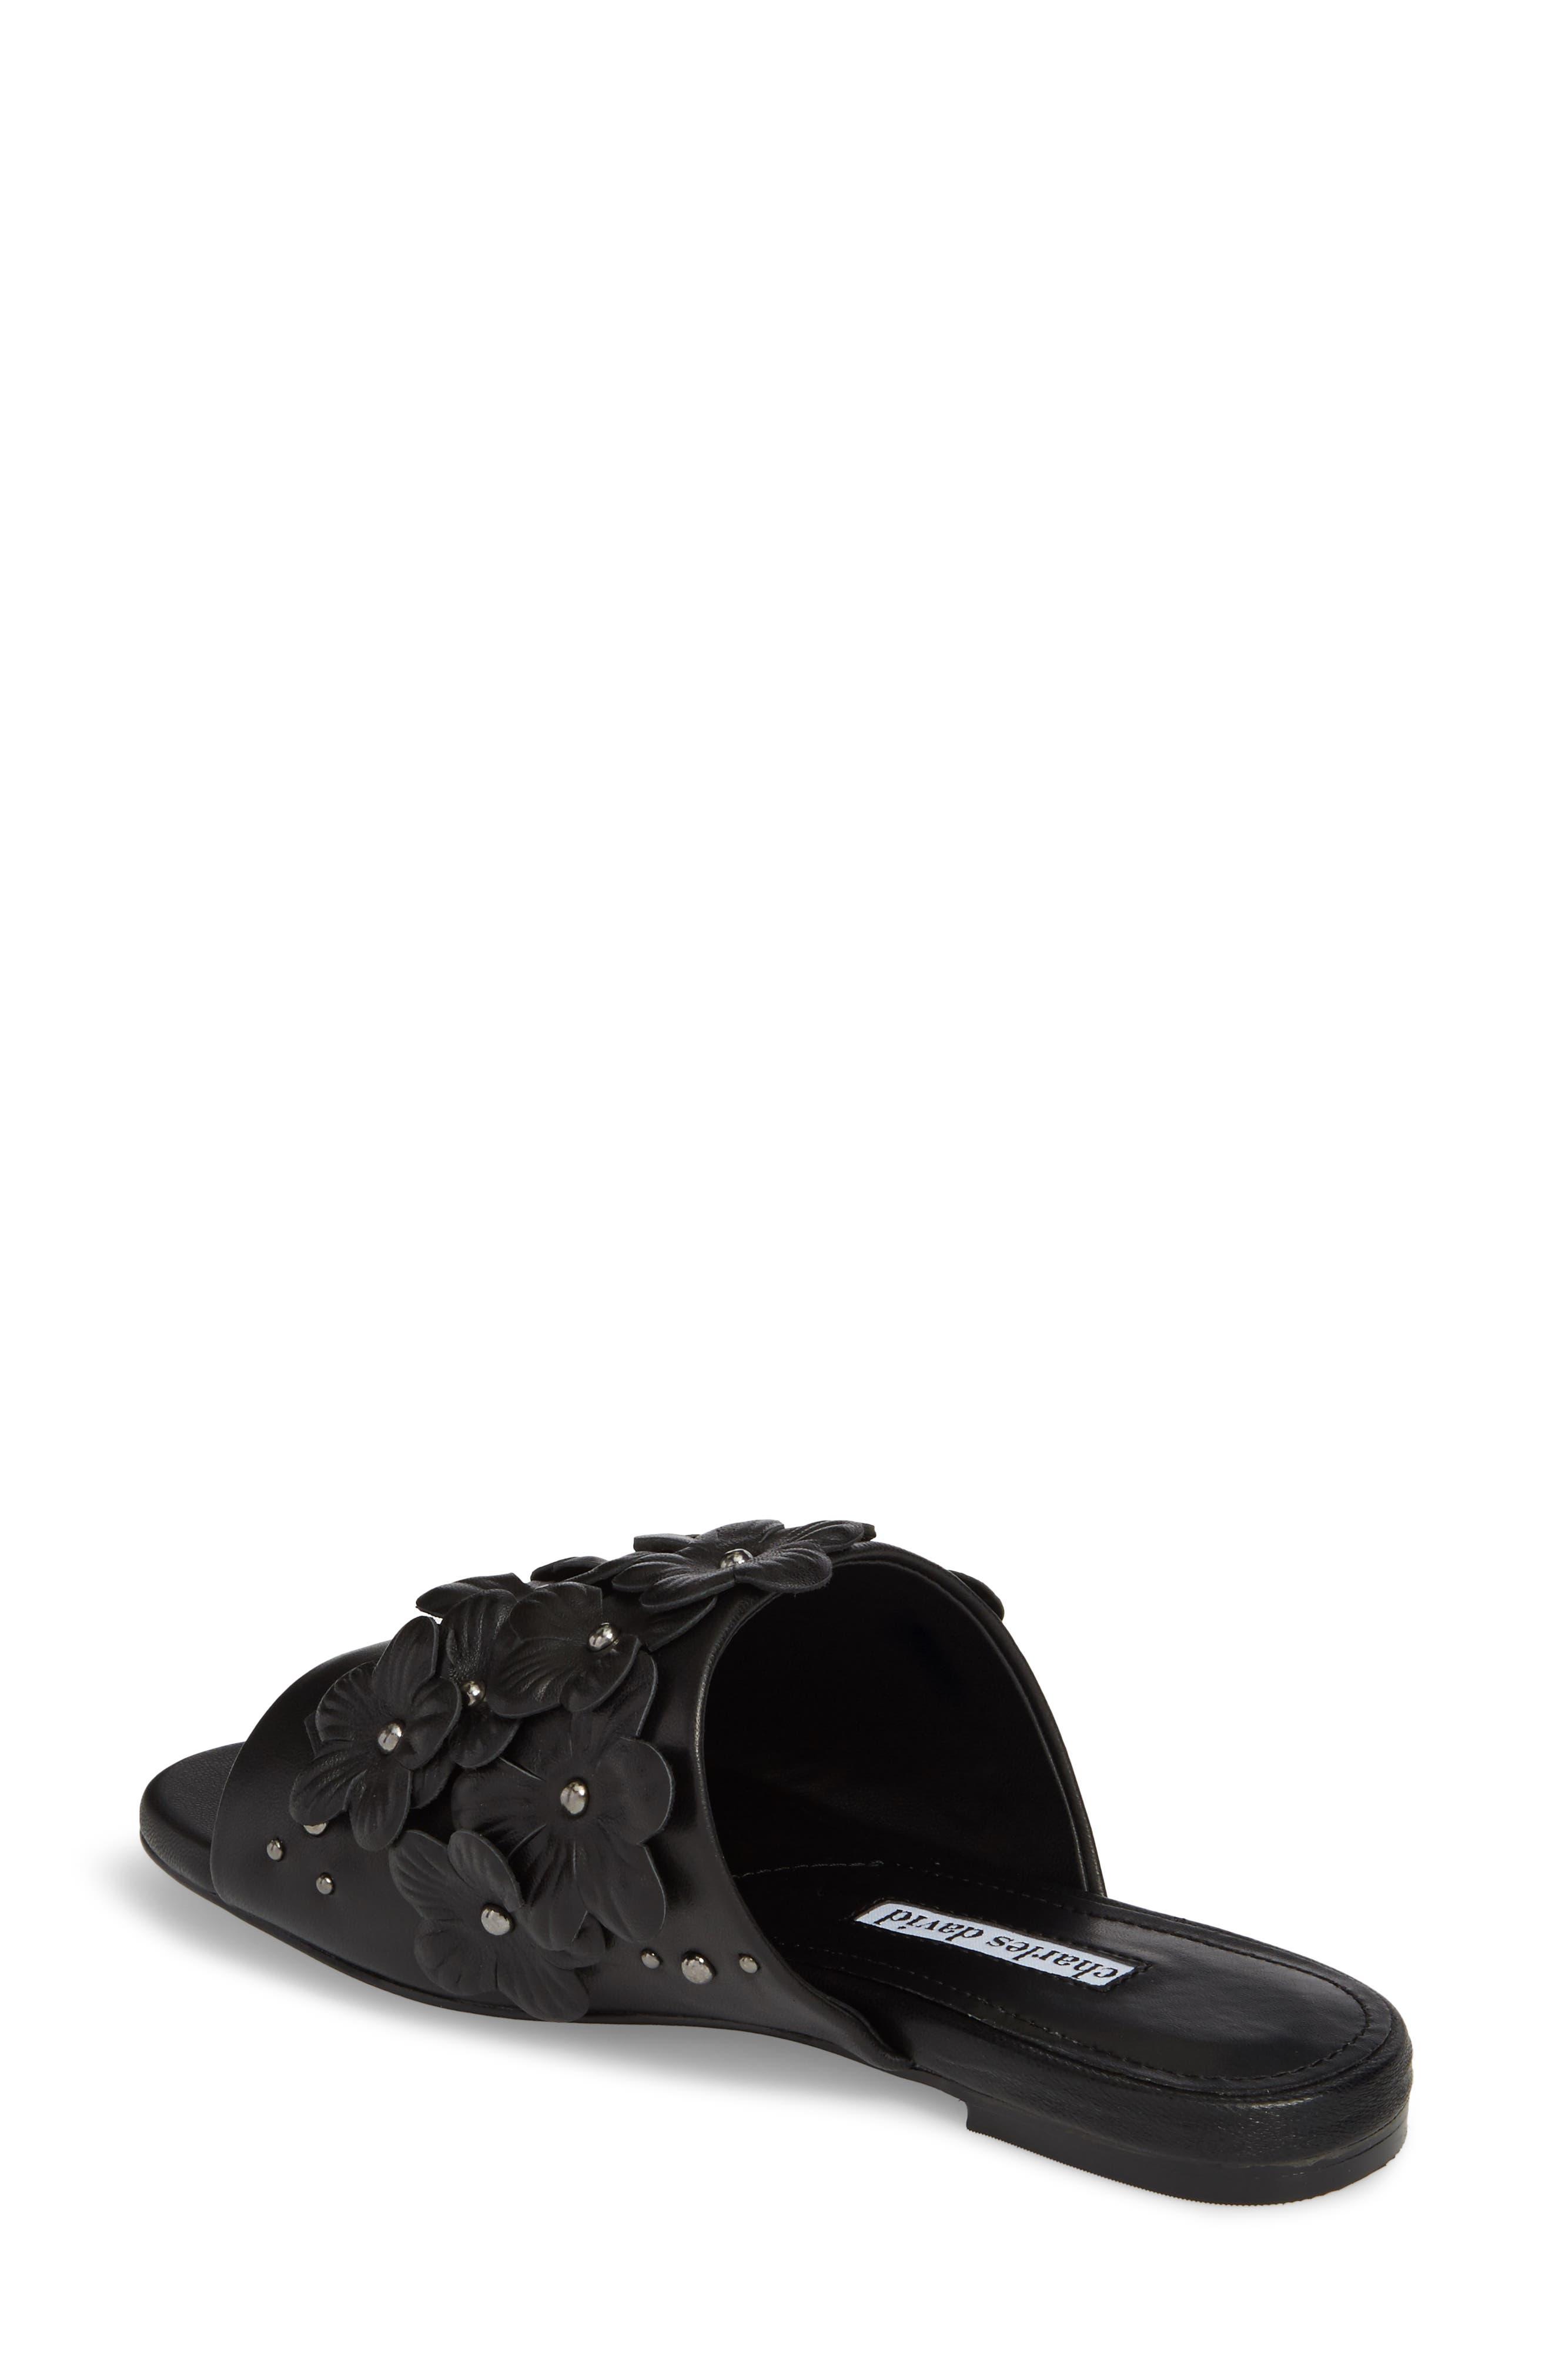 Alternate Image 2  - Charles David Sicilian Slide Sandal (Women)